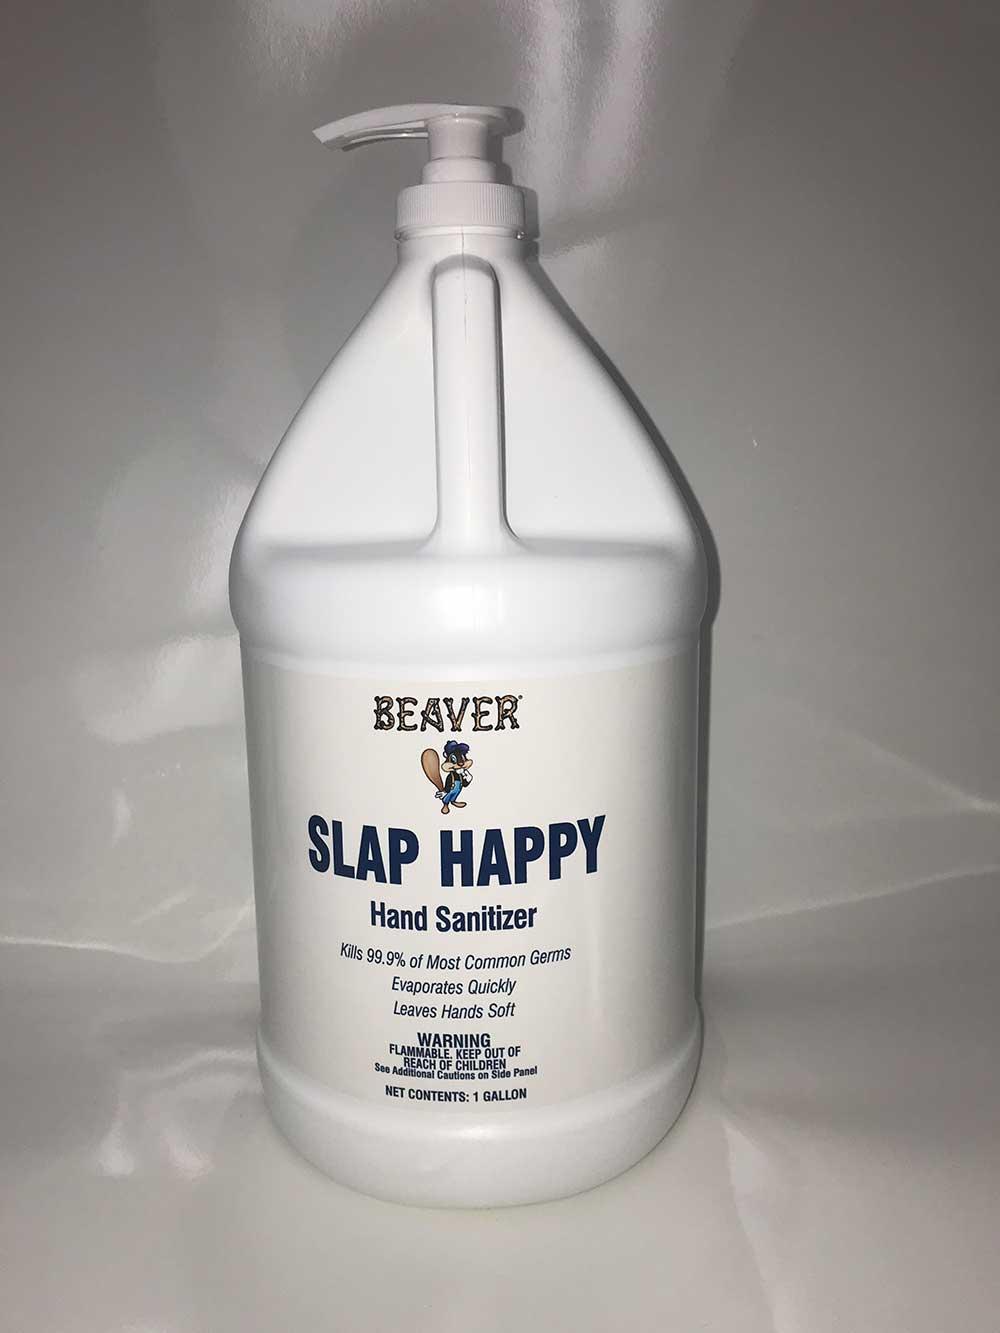 Beaver Slap Happy Hand Sanitizer